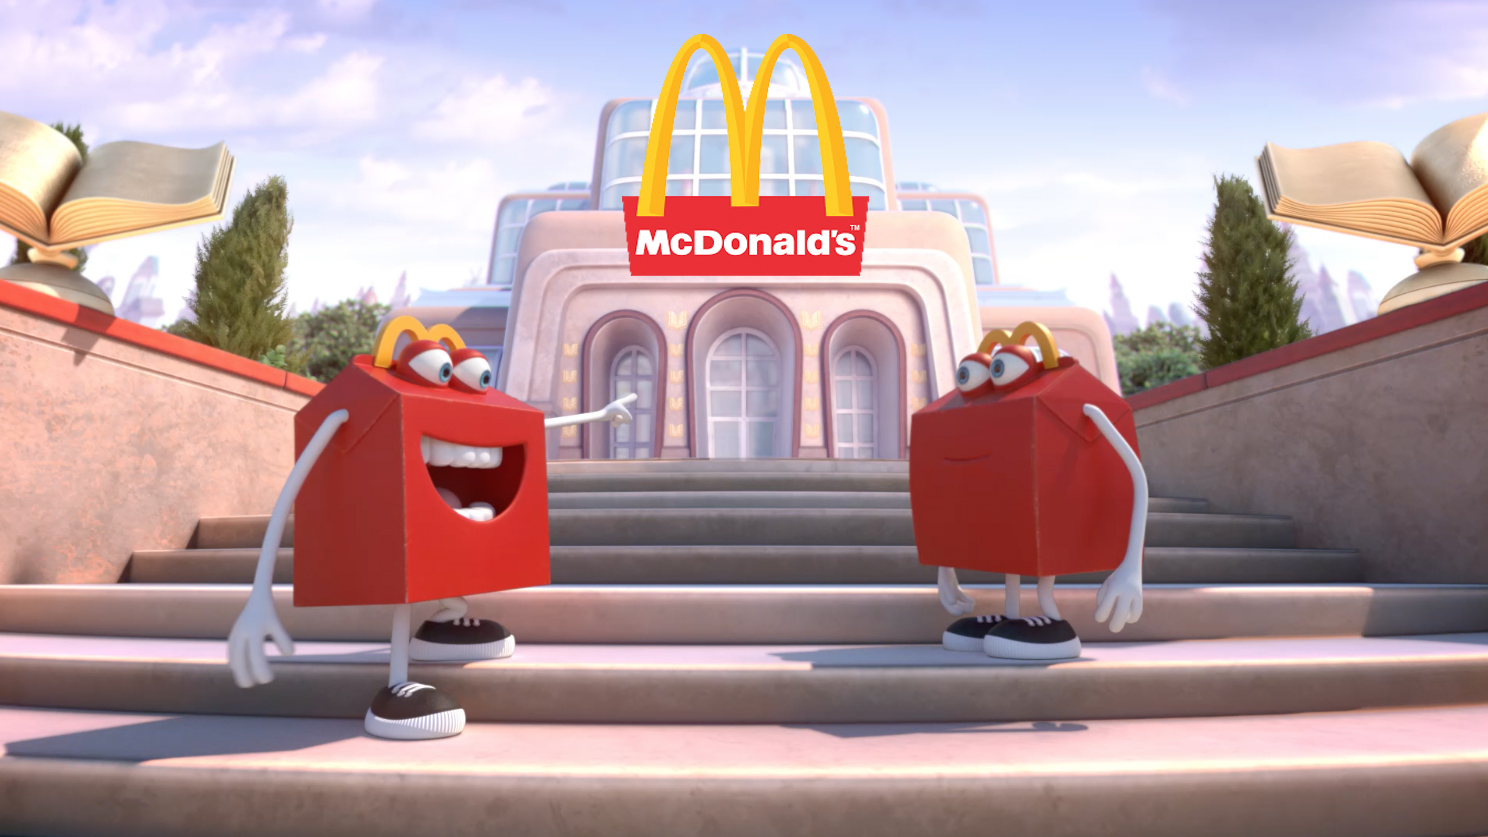 McDonald's - A Decade Long Legacy